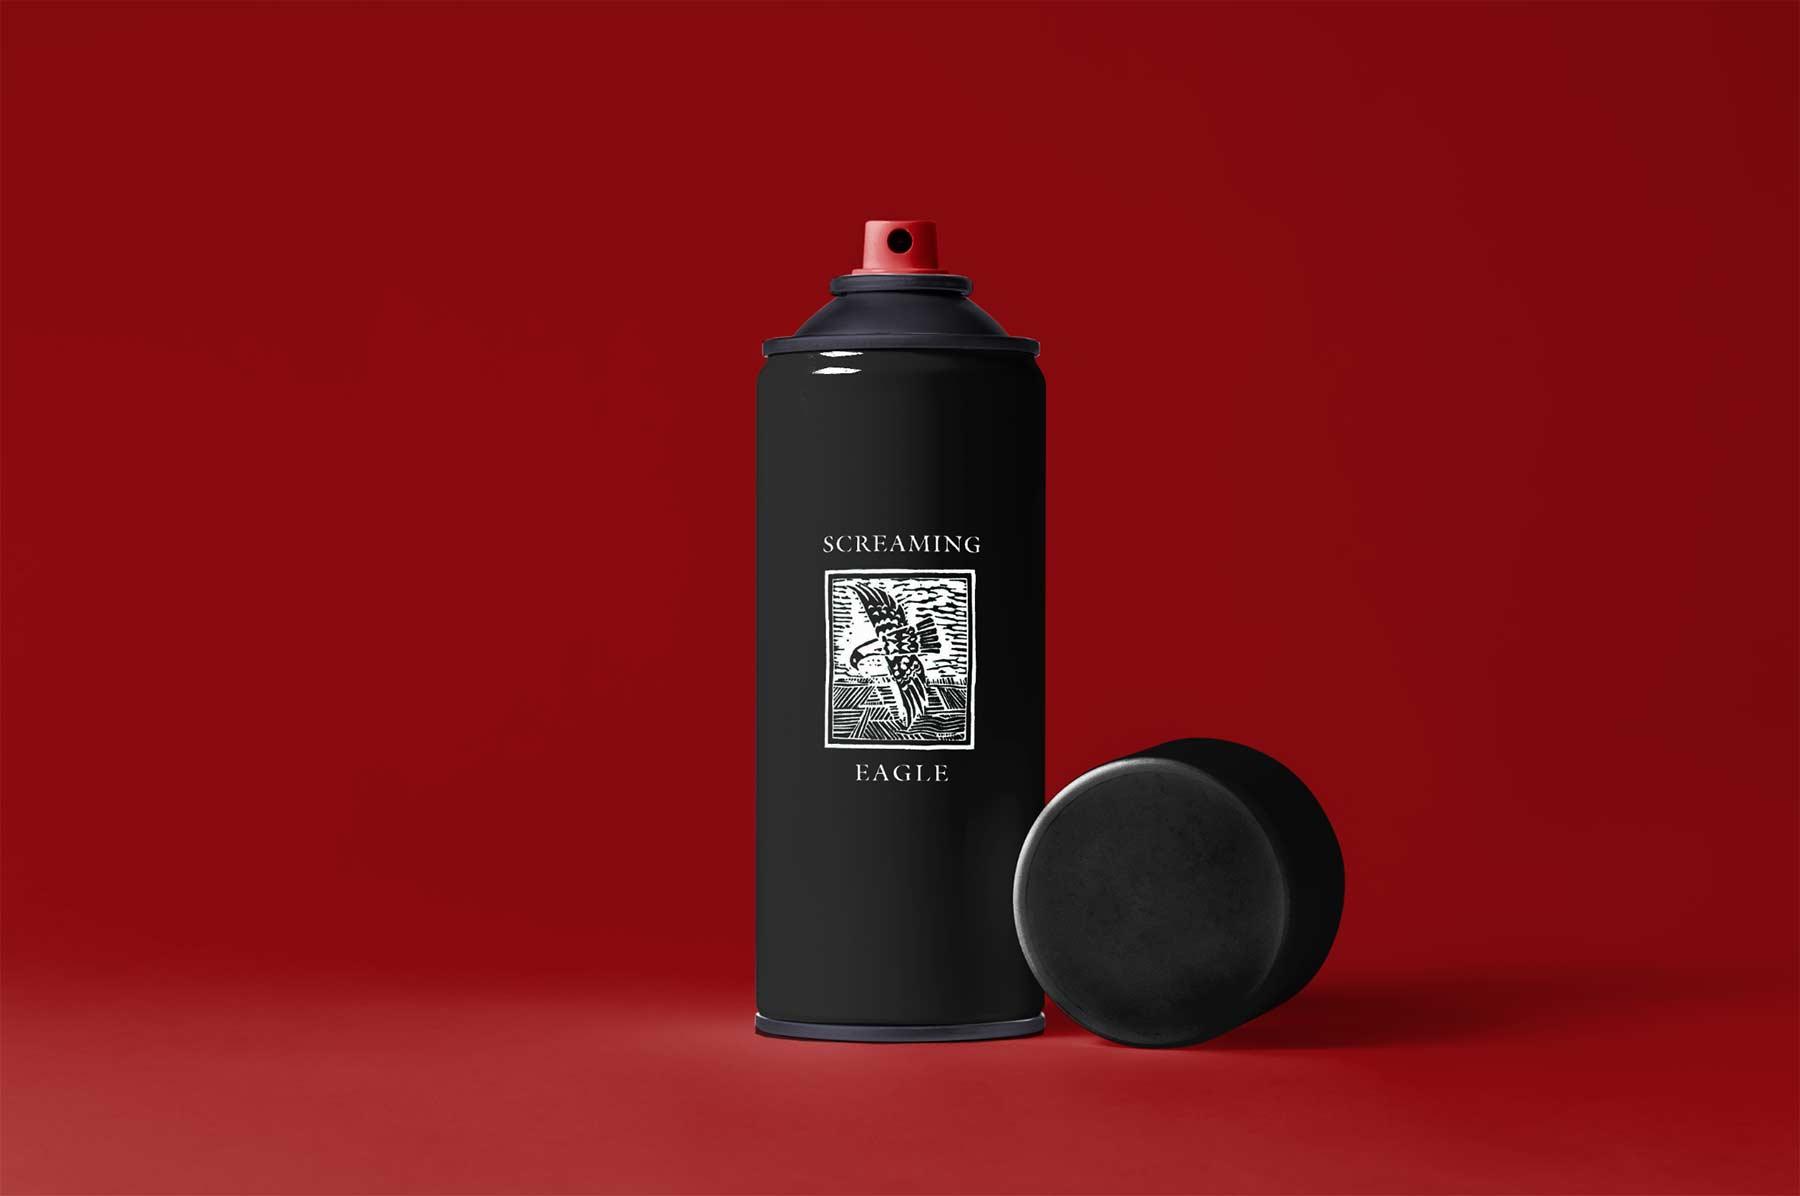 Luxus-Spraydosen Nouveau-Riche-luxus-farbdosen_05